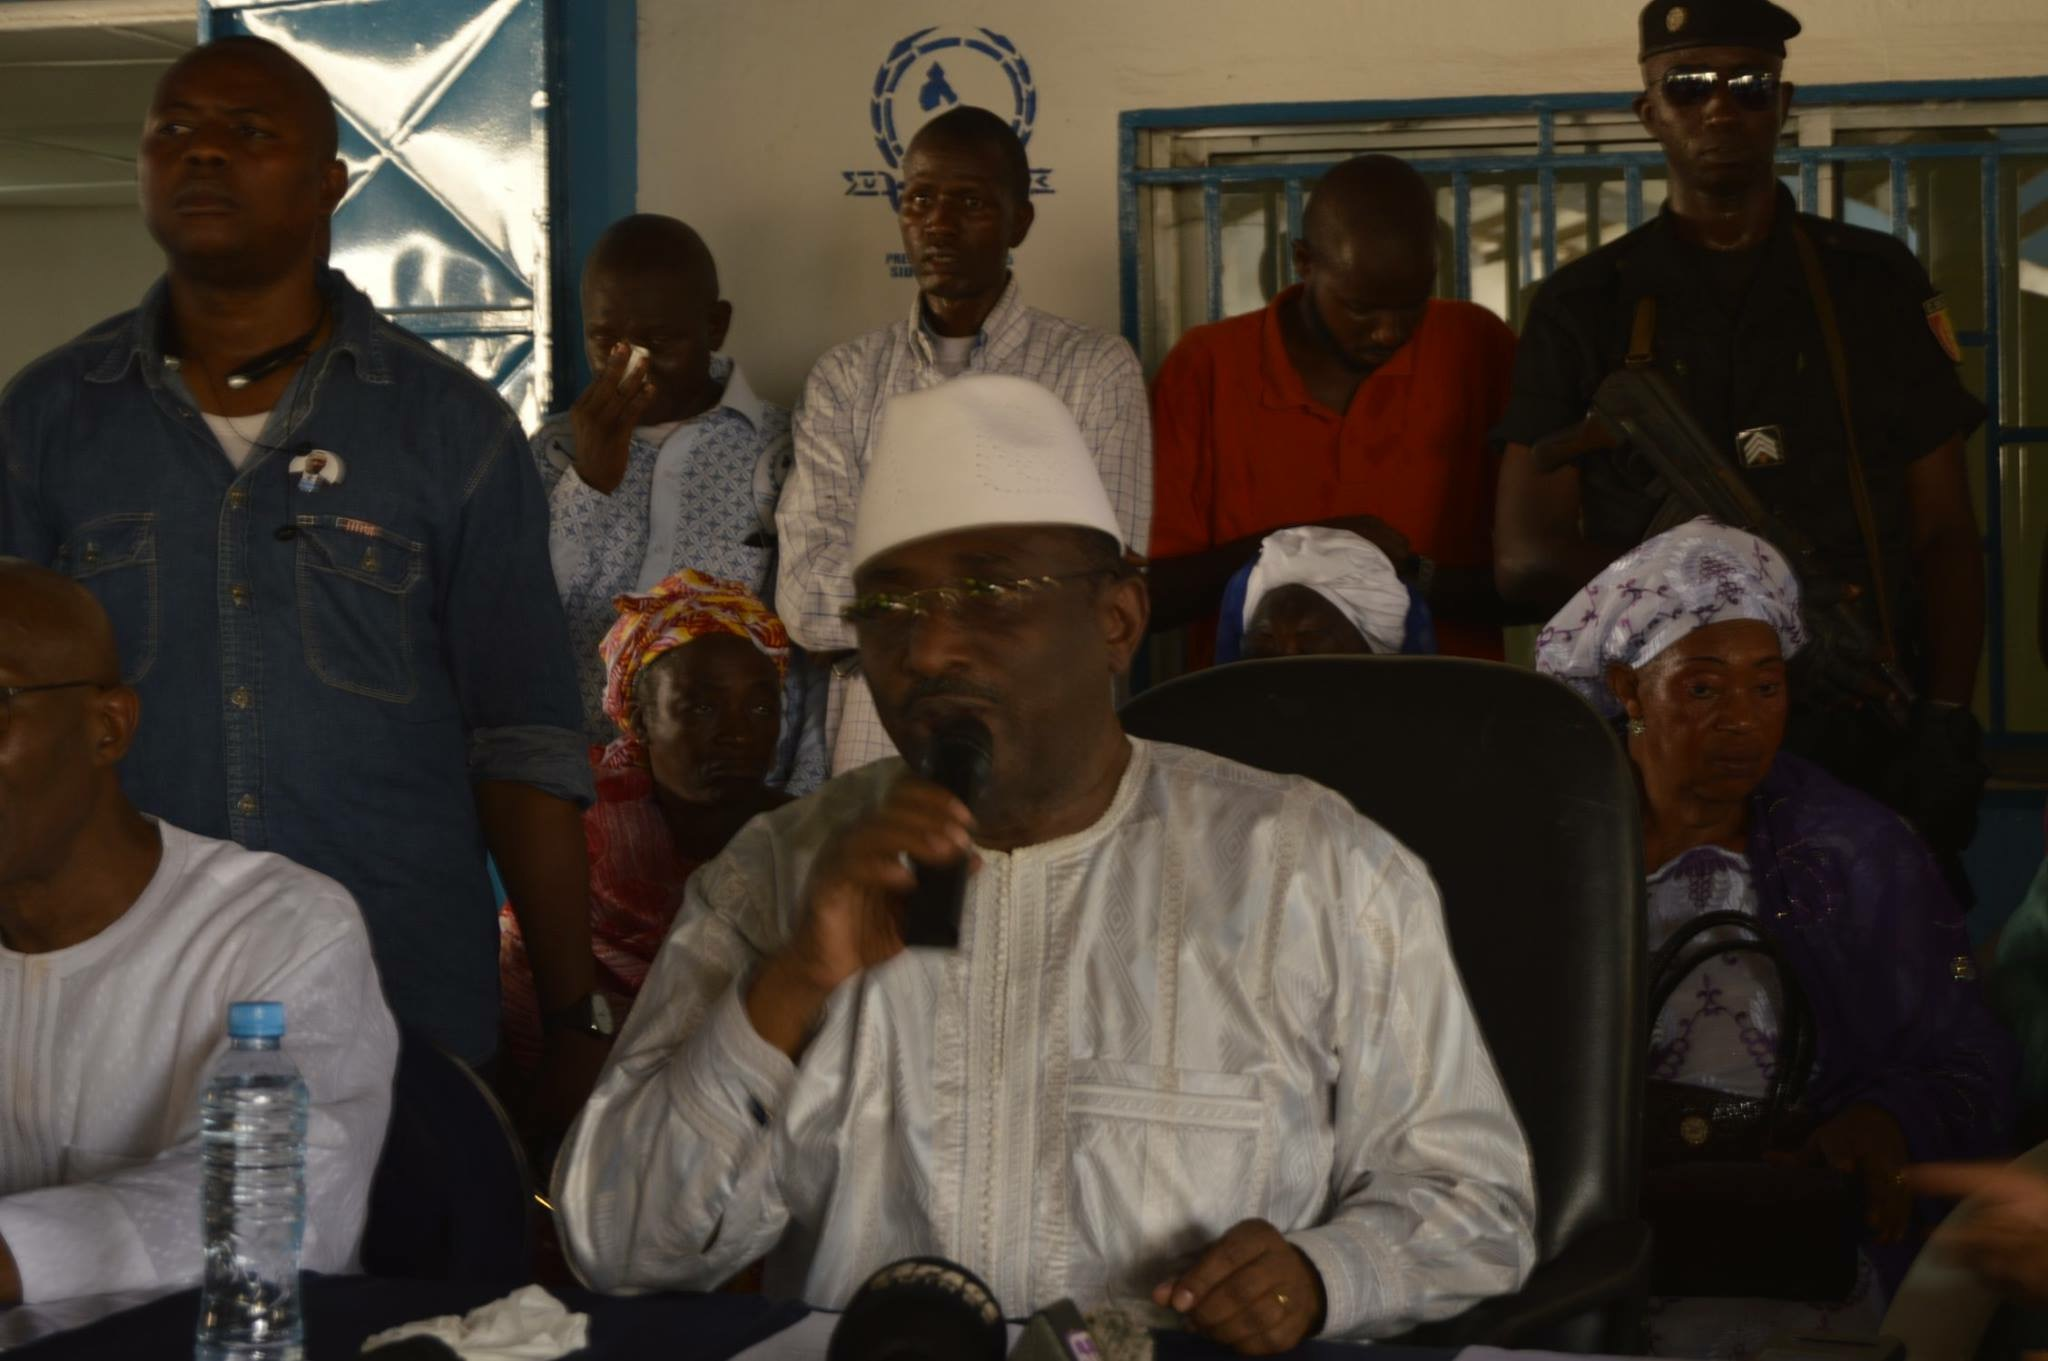 Sidya Touré UFR